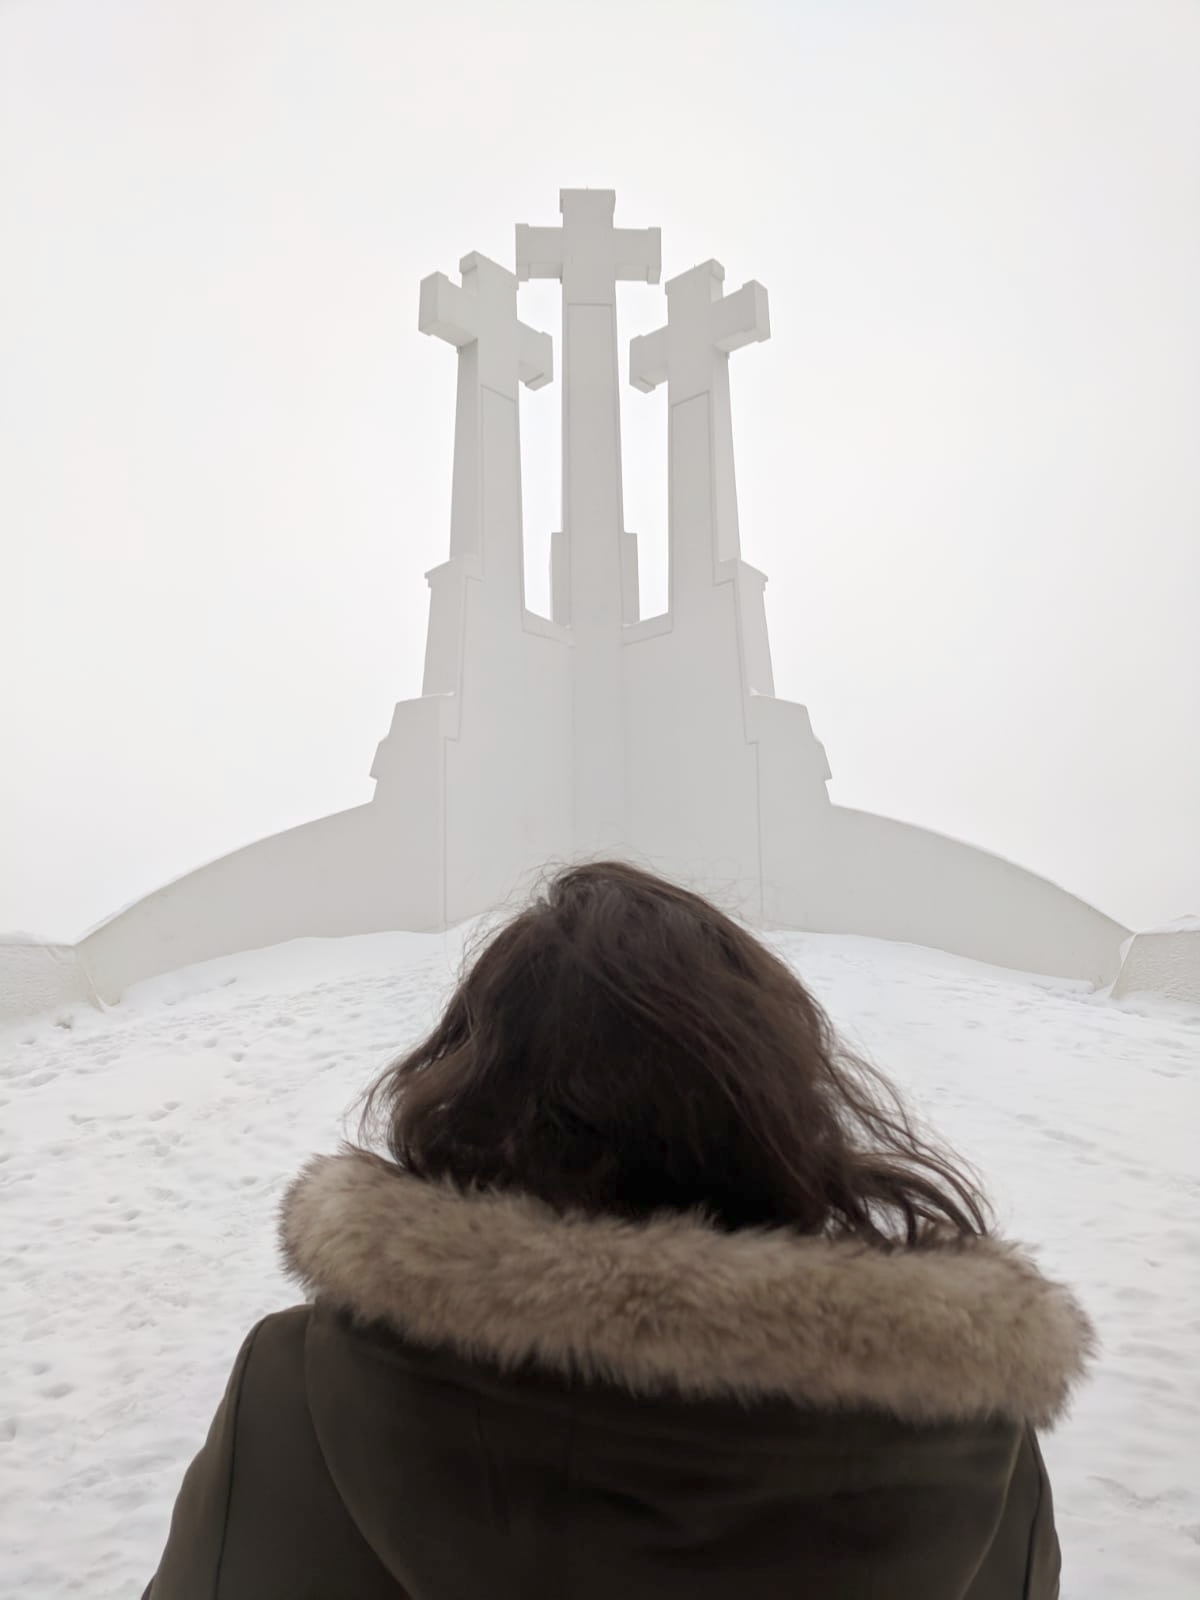 vilnius hill of three crosses